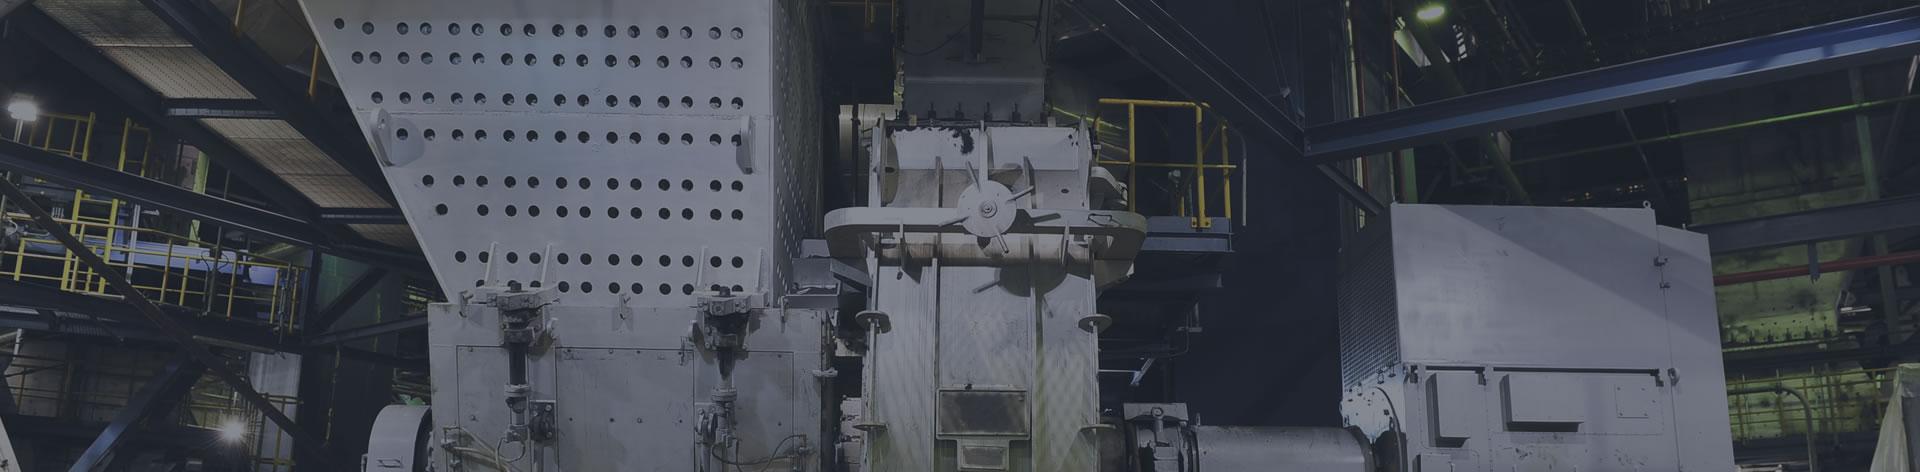 banner_coal_preparation_and_handling